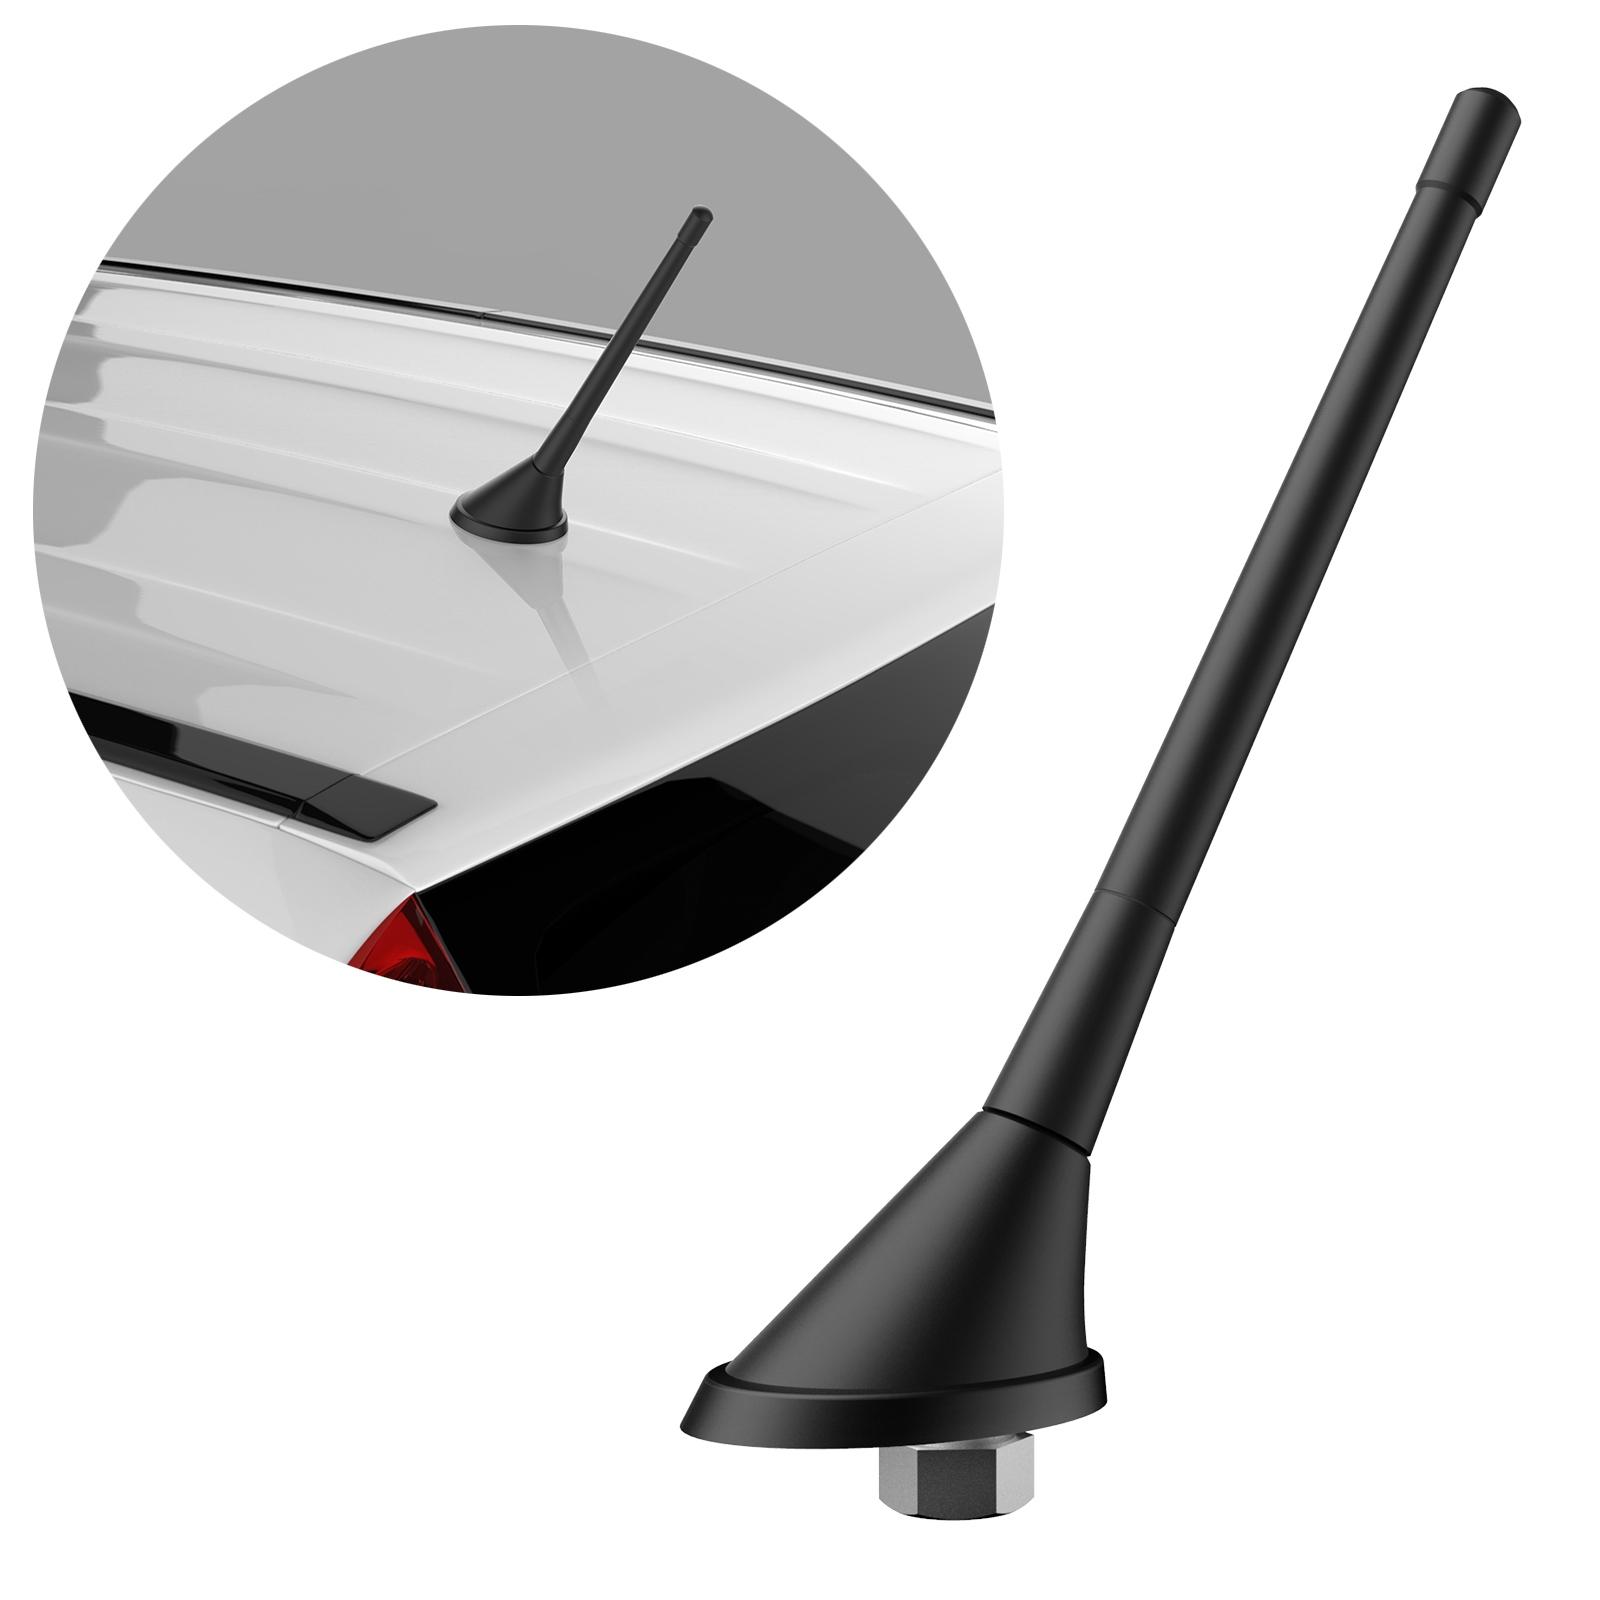 RADIO VW AUDI DACH-ANTENNE GPS FM Antennenfuss 40cm Verstärker DIN Kabel Adapter